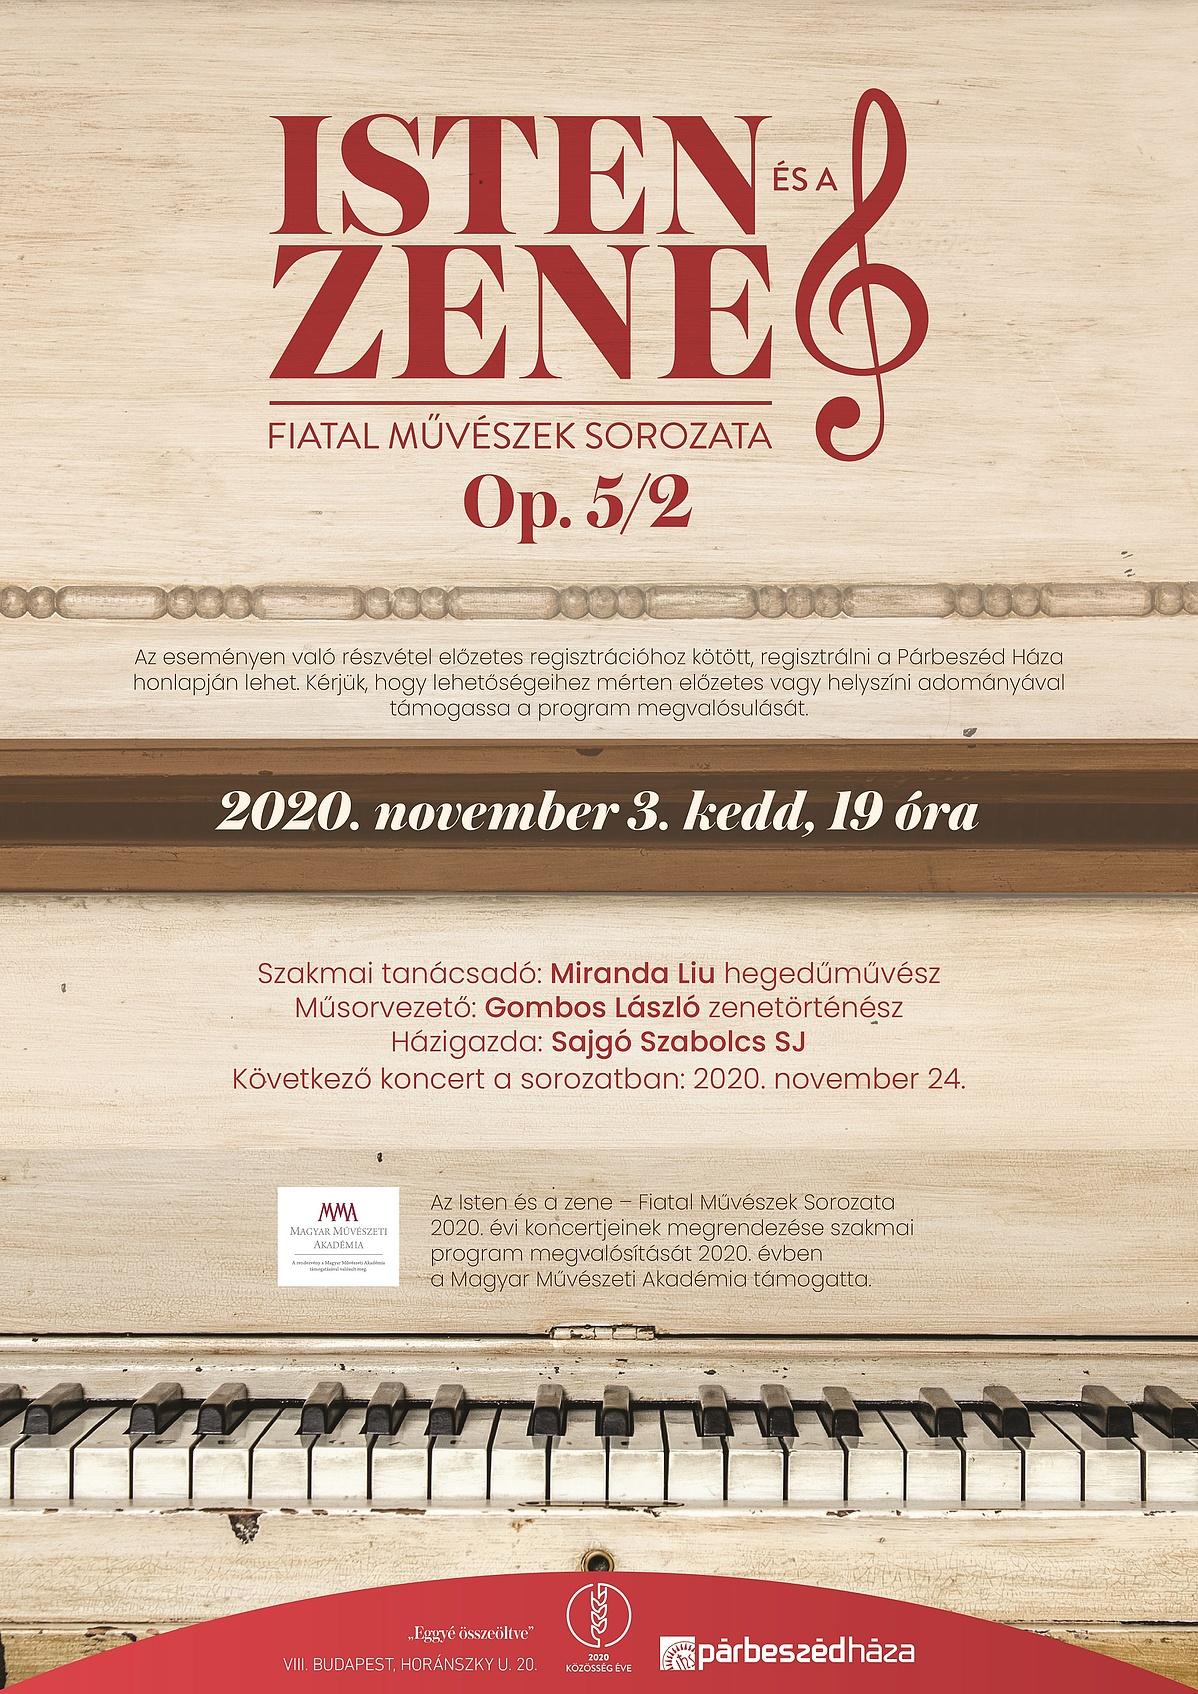 Plakat_IstenesaZene_52_2020_ParbeszedHaza_A3_2020_1019_print1-095210.jpg